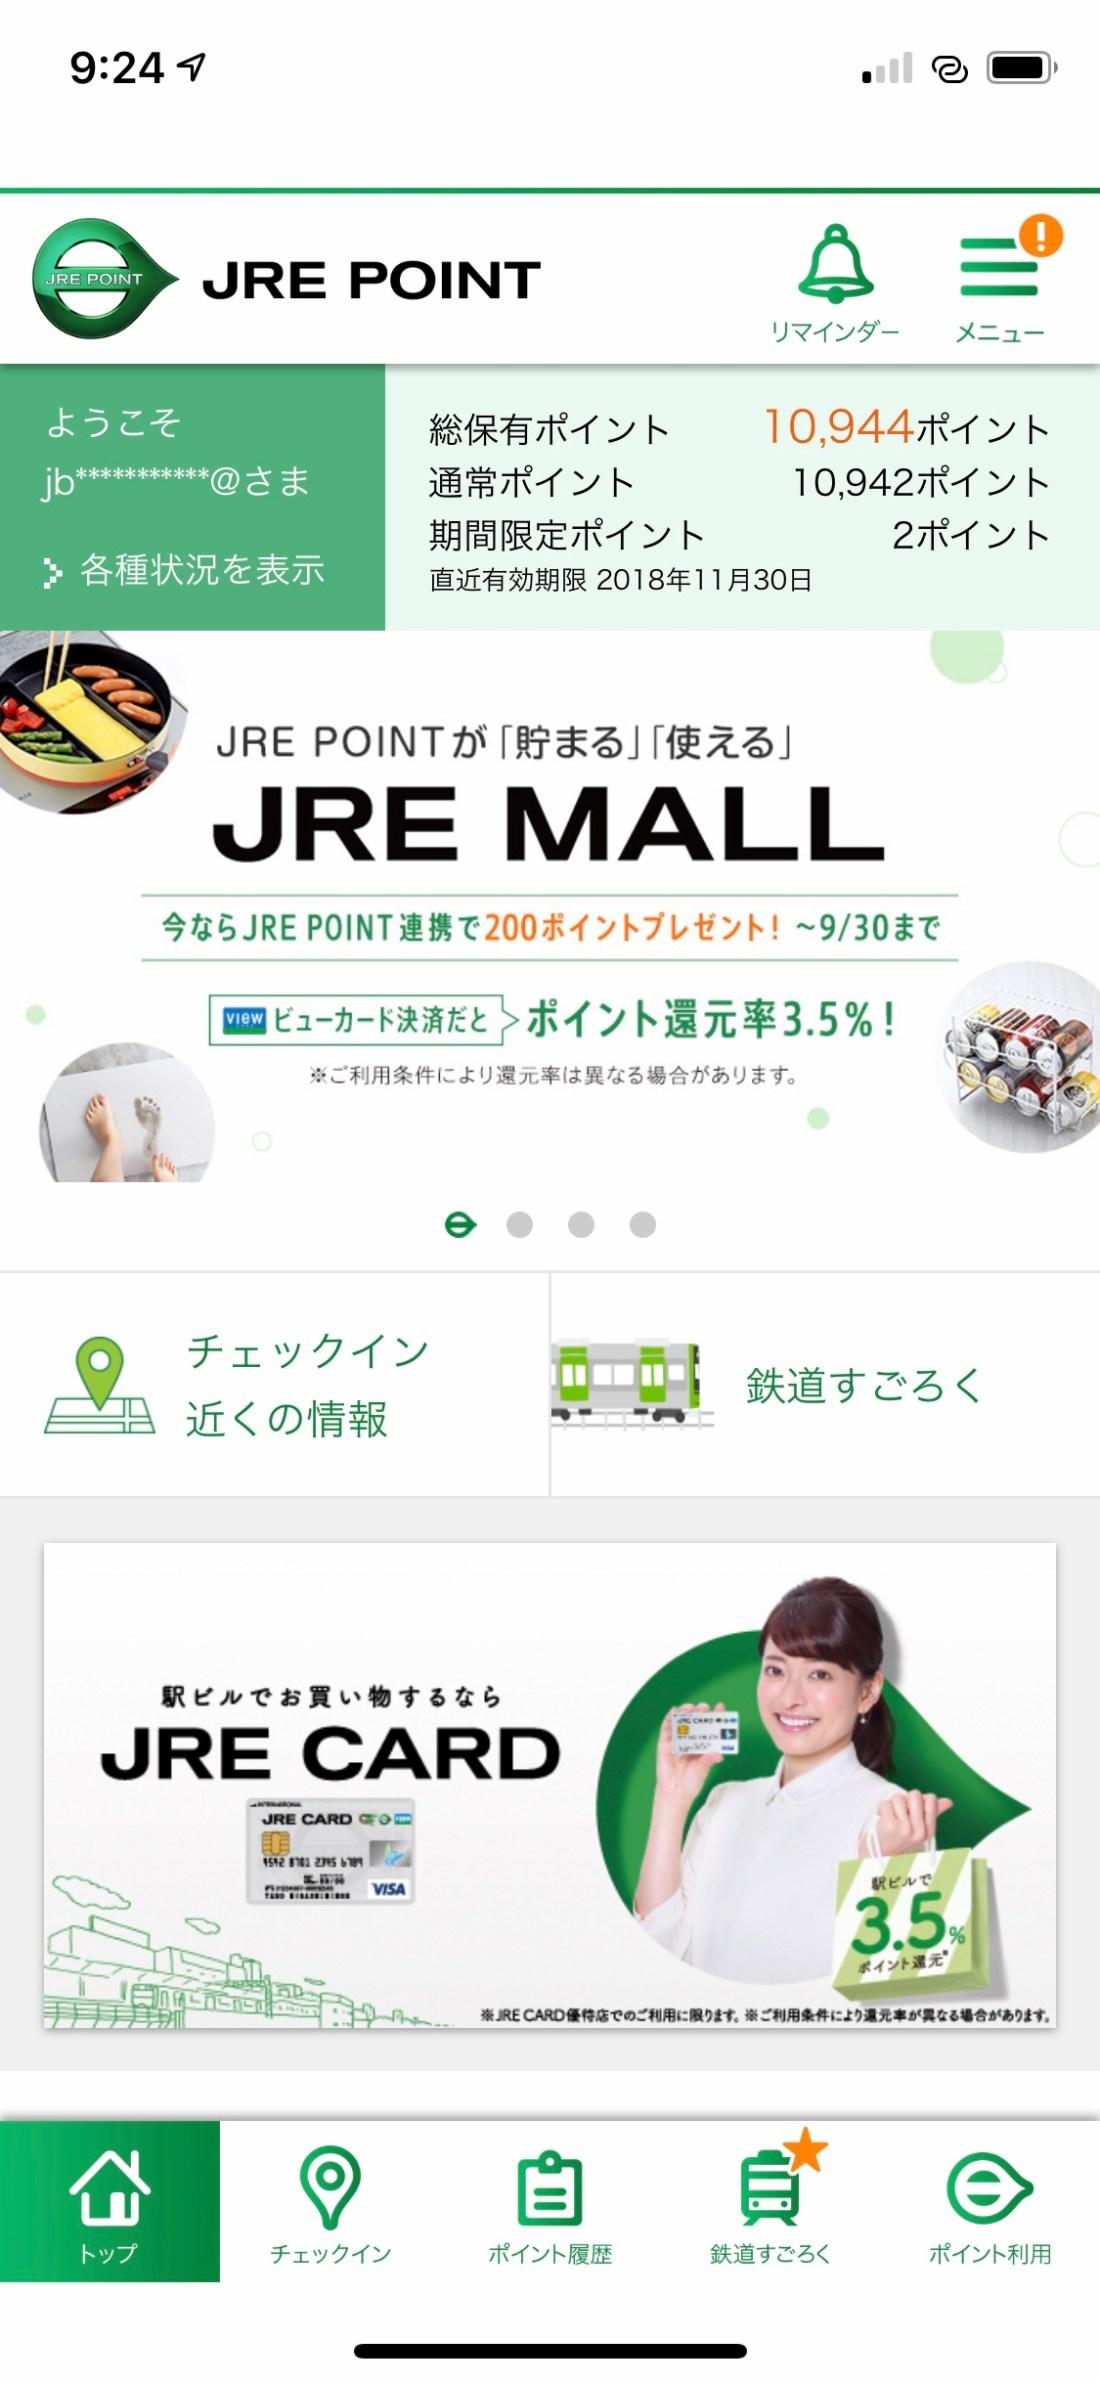 Jre Point App Main Screen